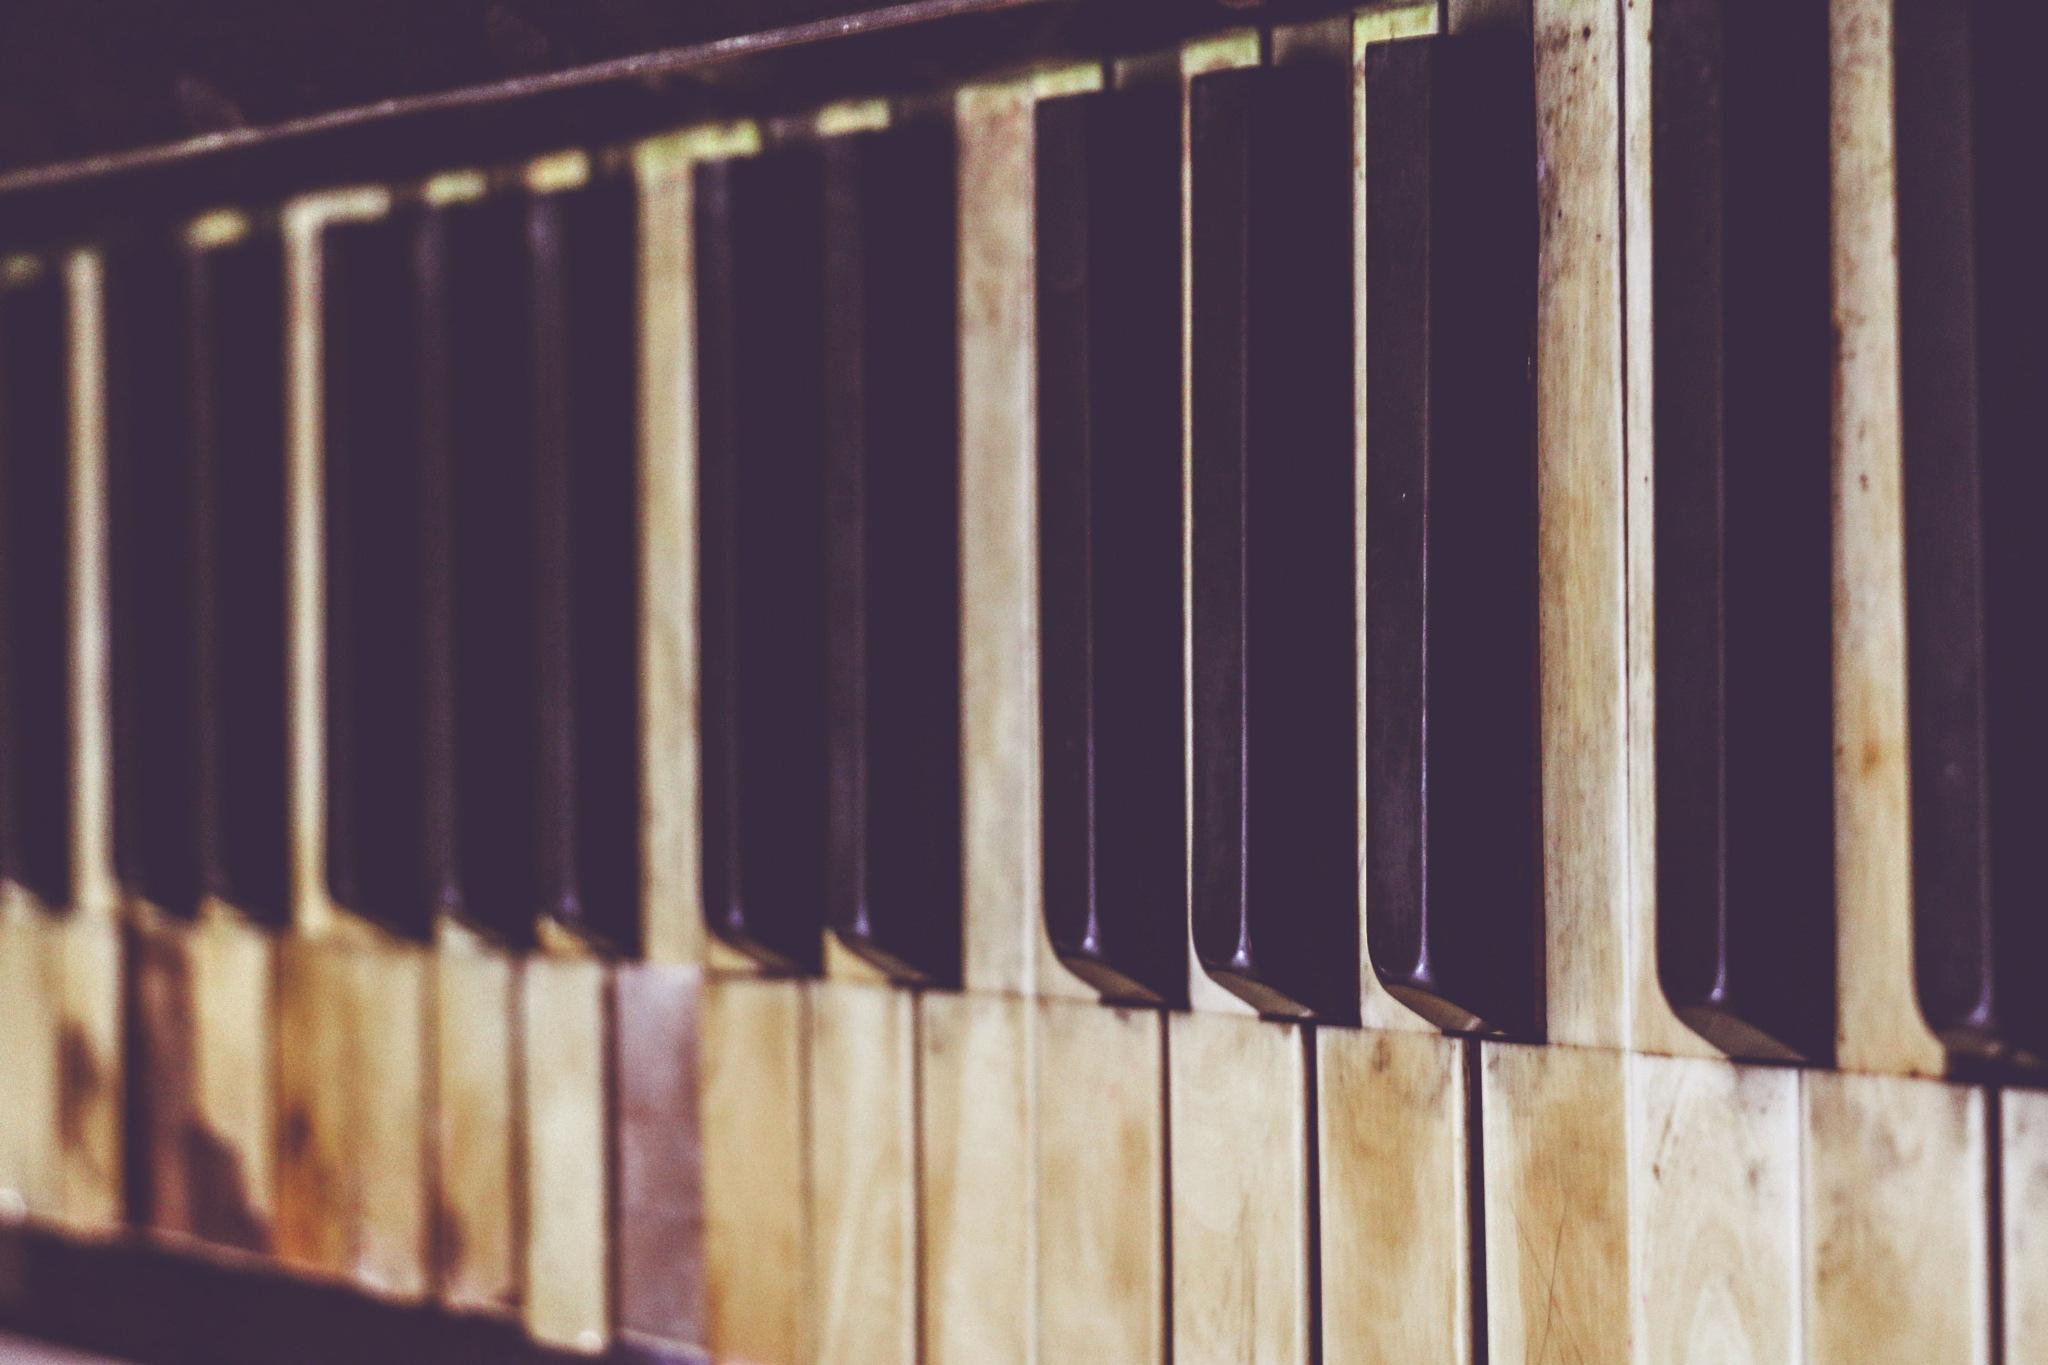 Boisselot Piano by Asma Ahmed